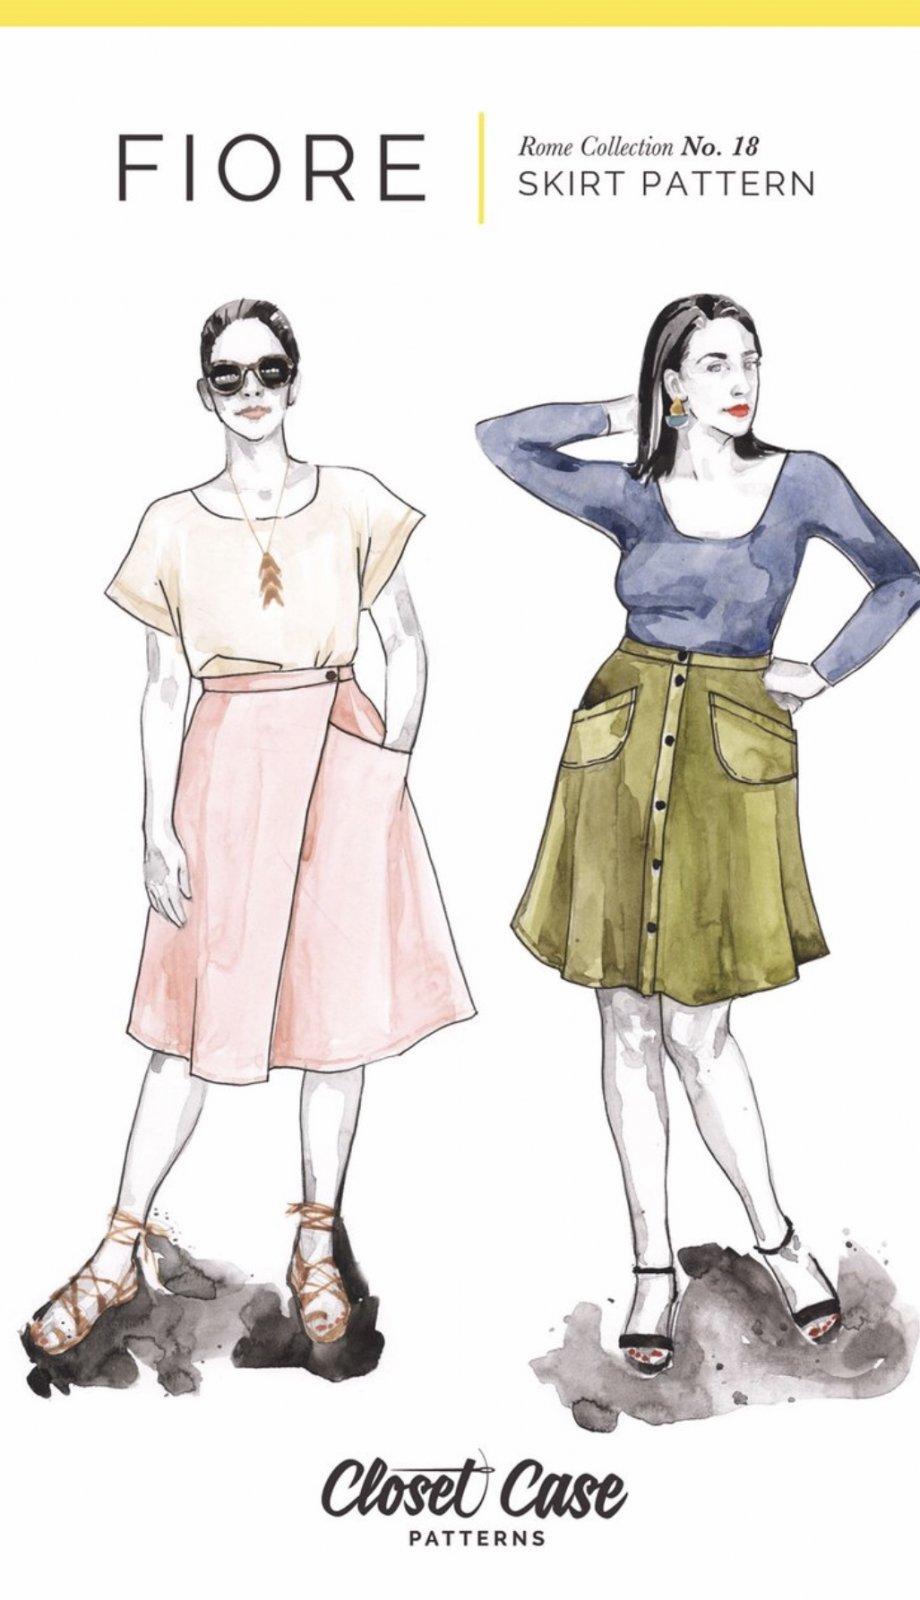 Closet Case - Fiore Skirt Pattern